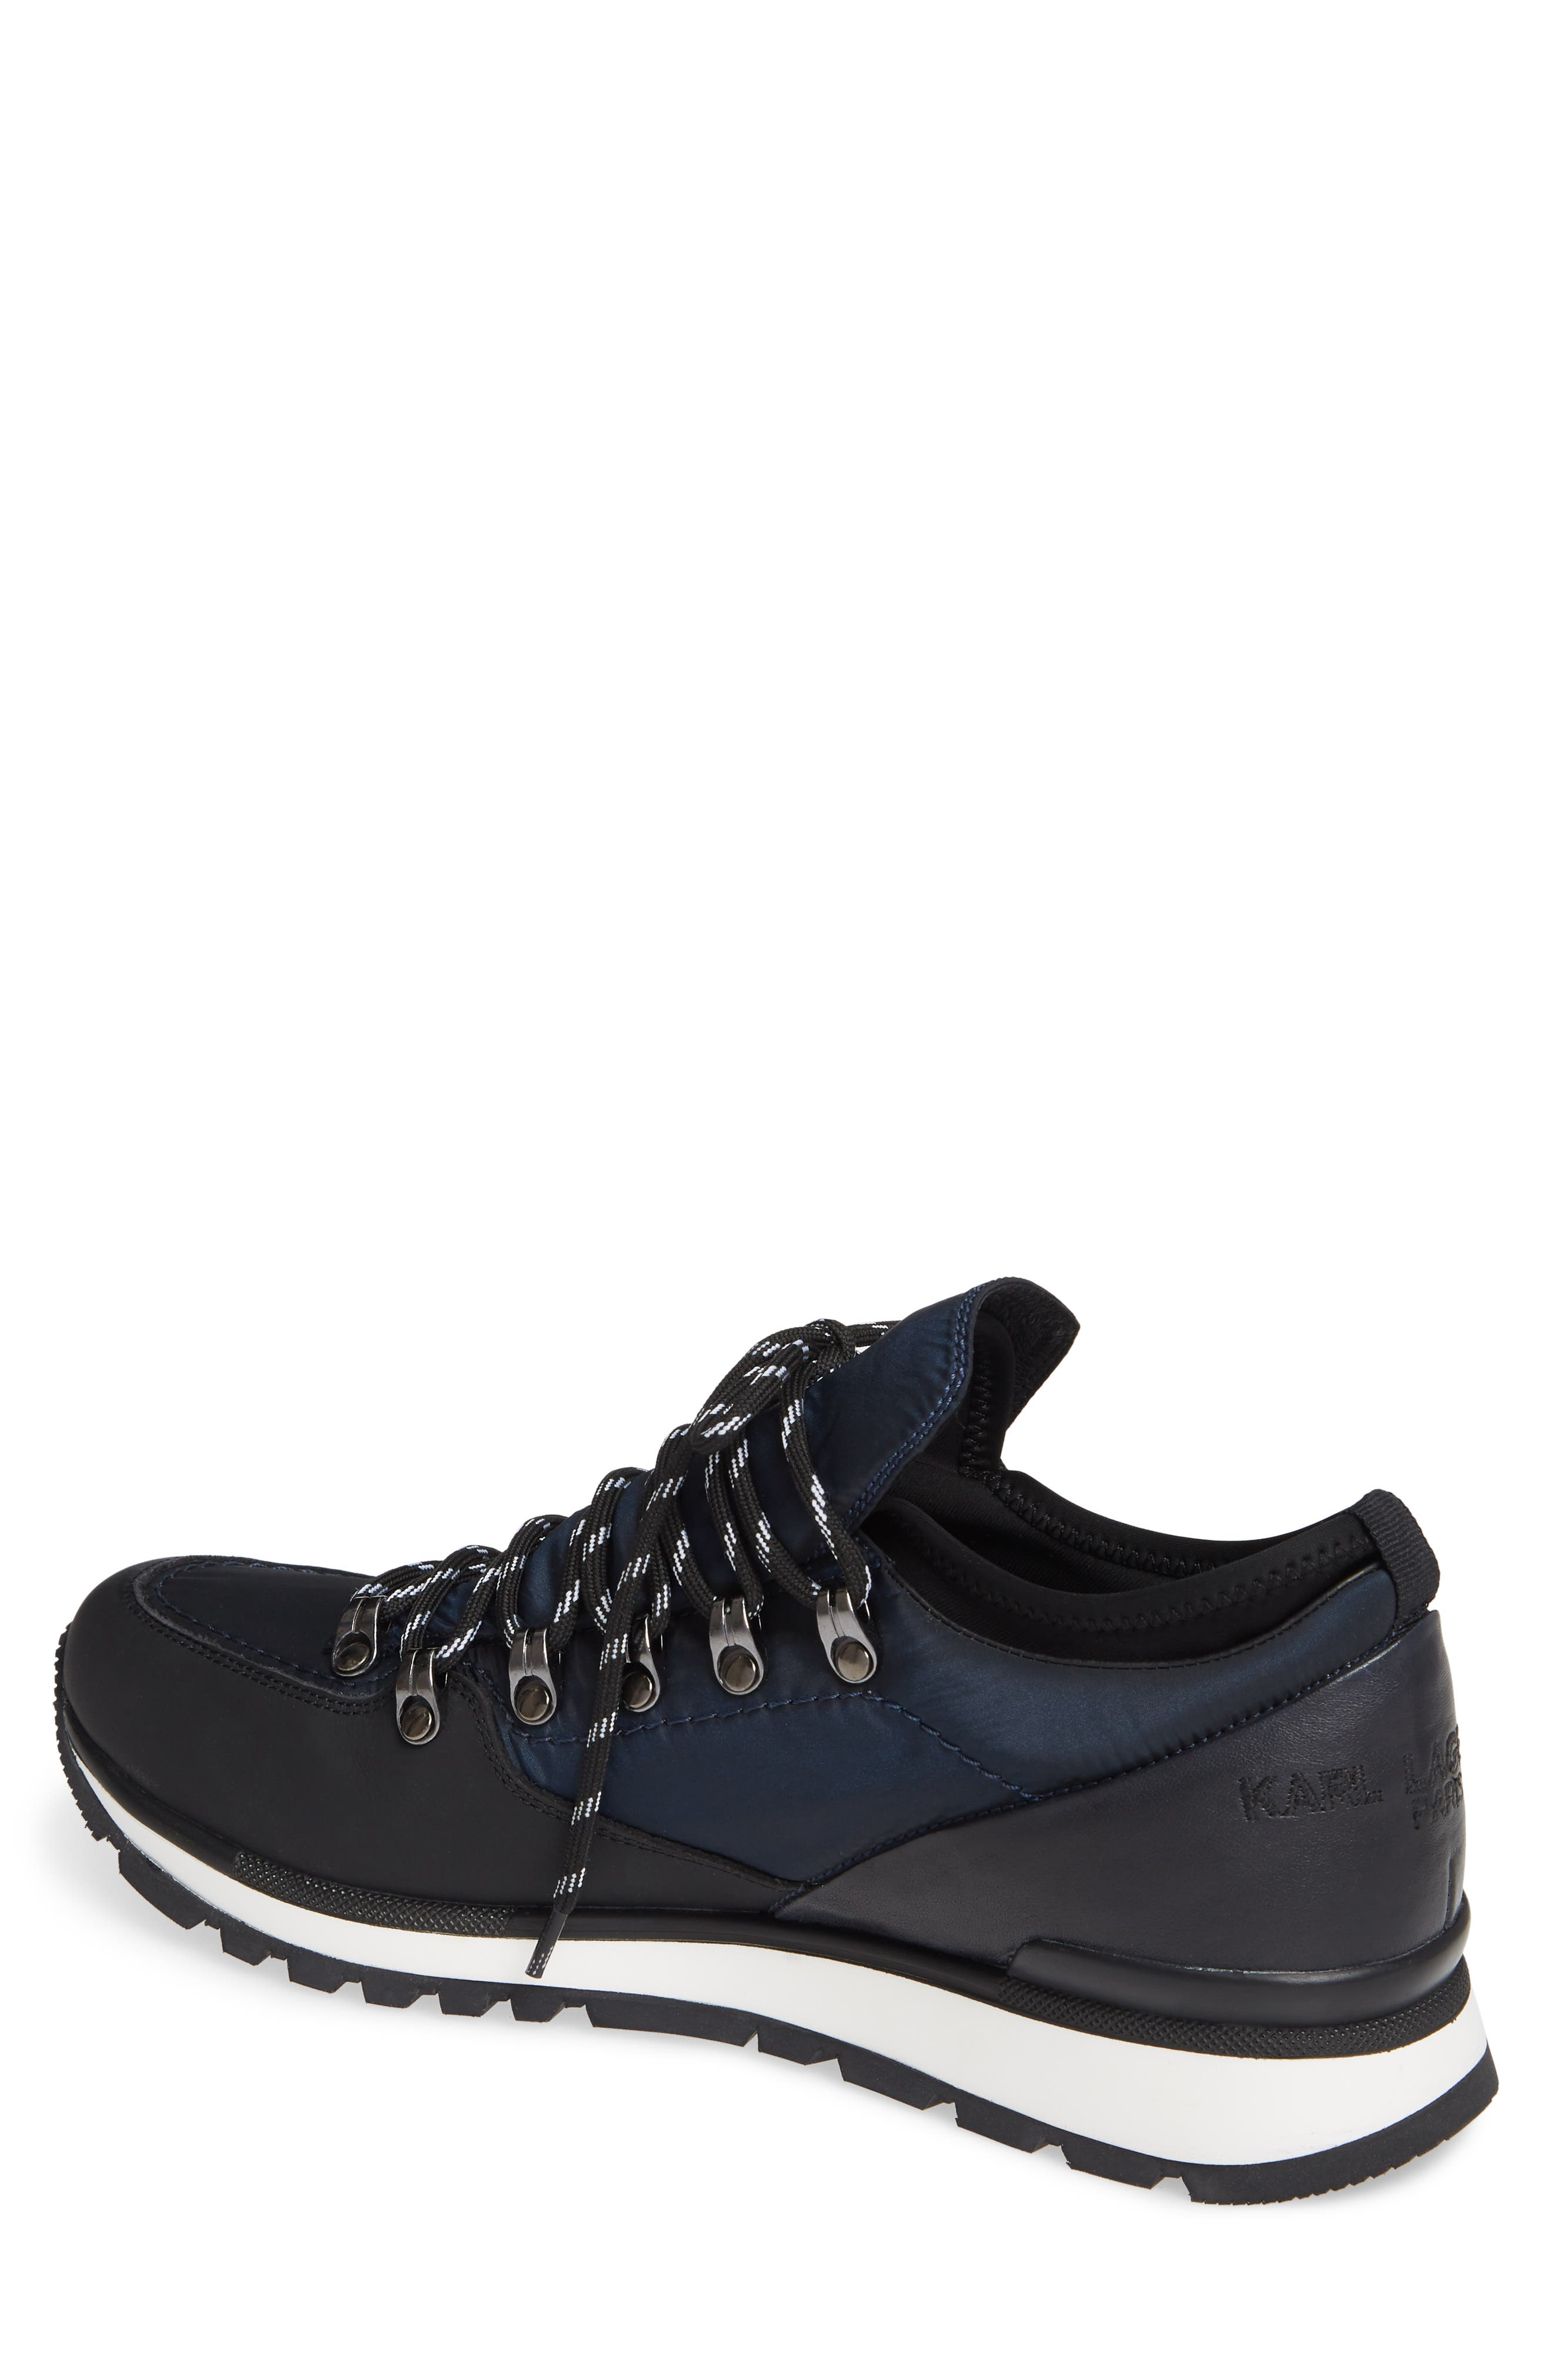 Low Top Hiker Sneaker,                             Alternate thumbnail 2, color,                             NAVY